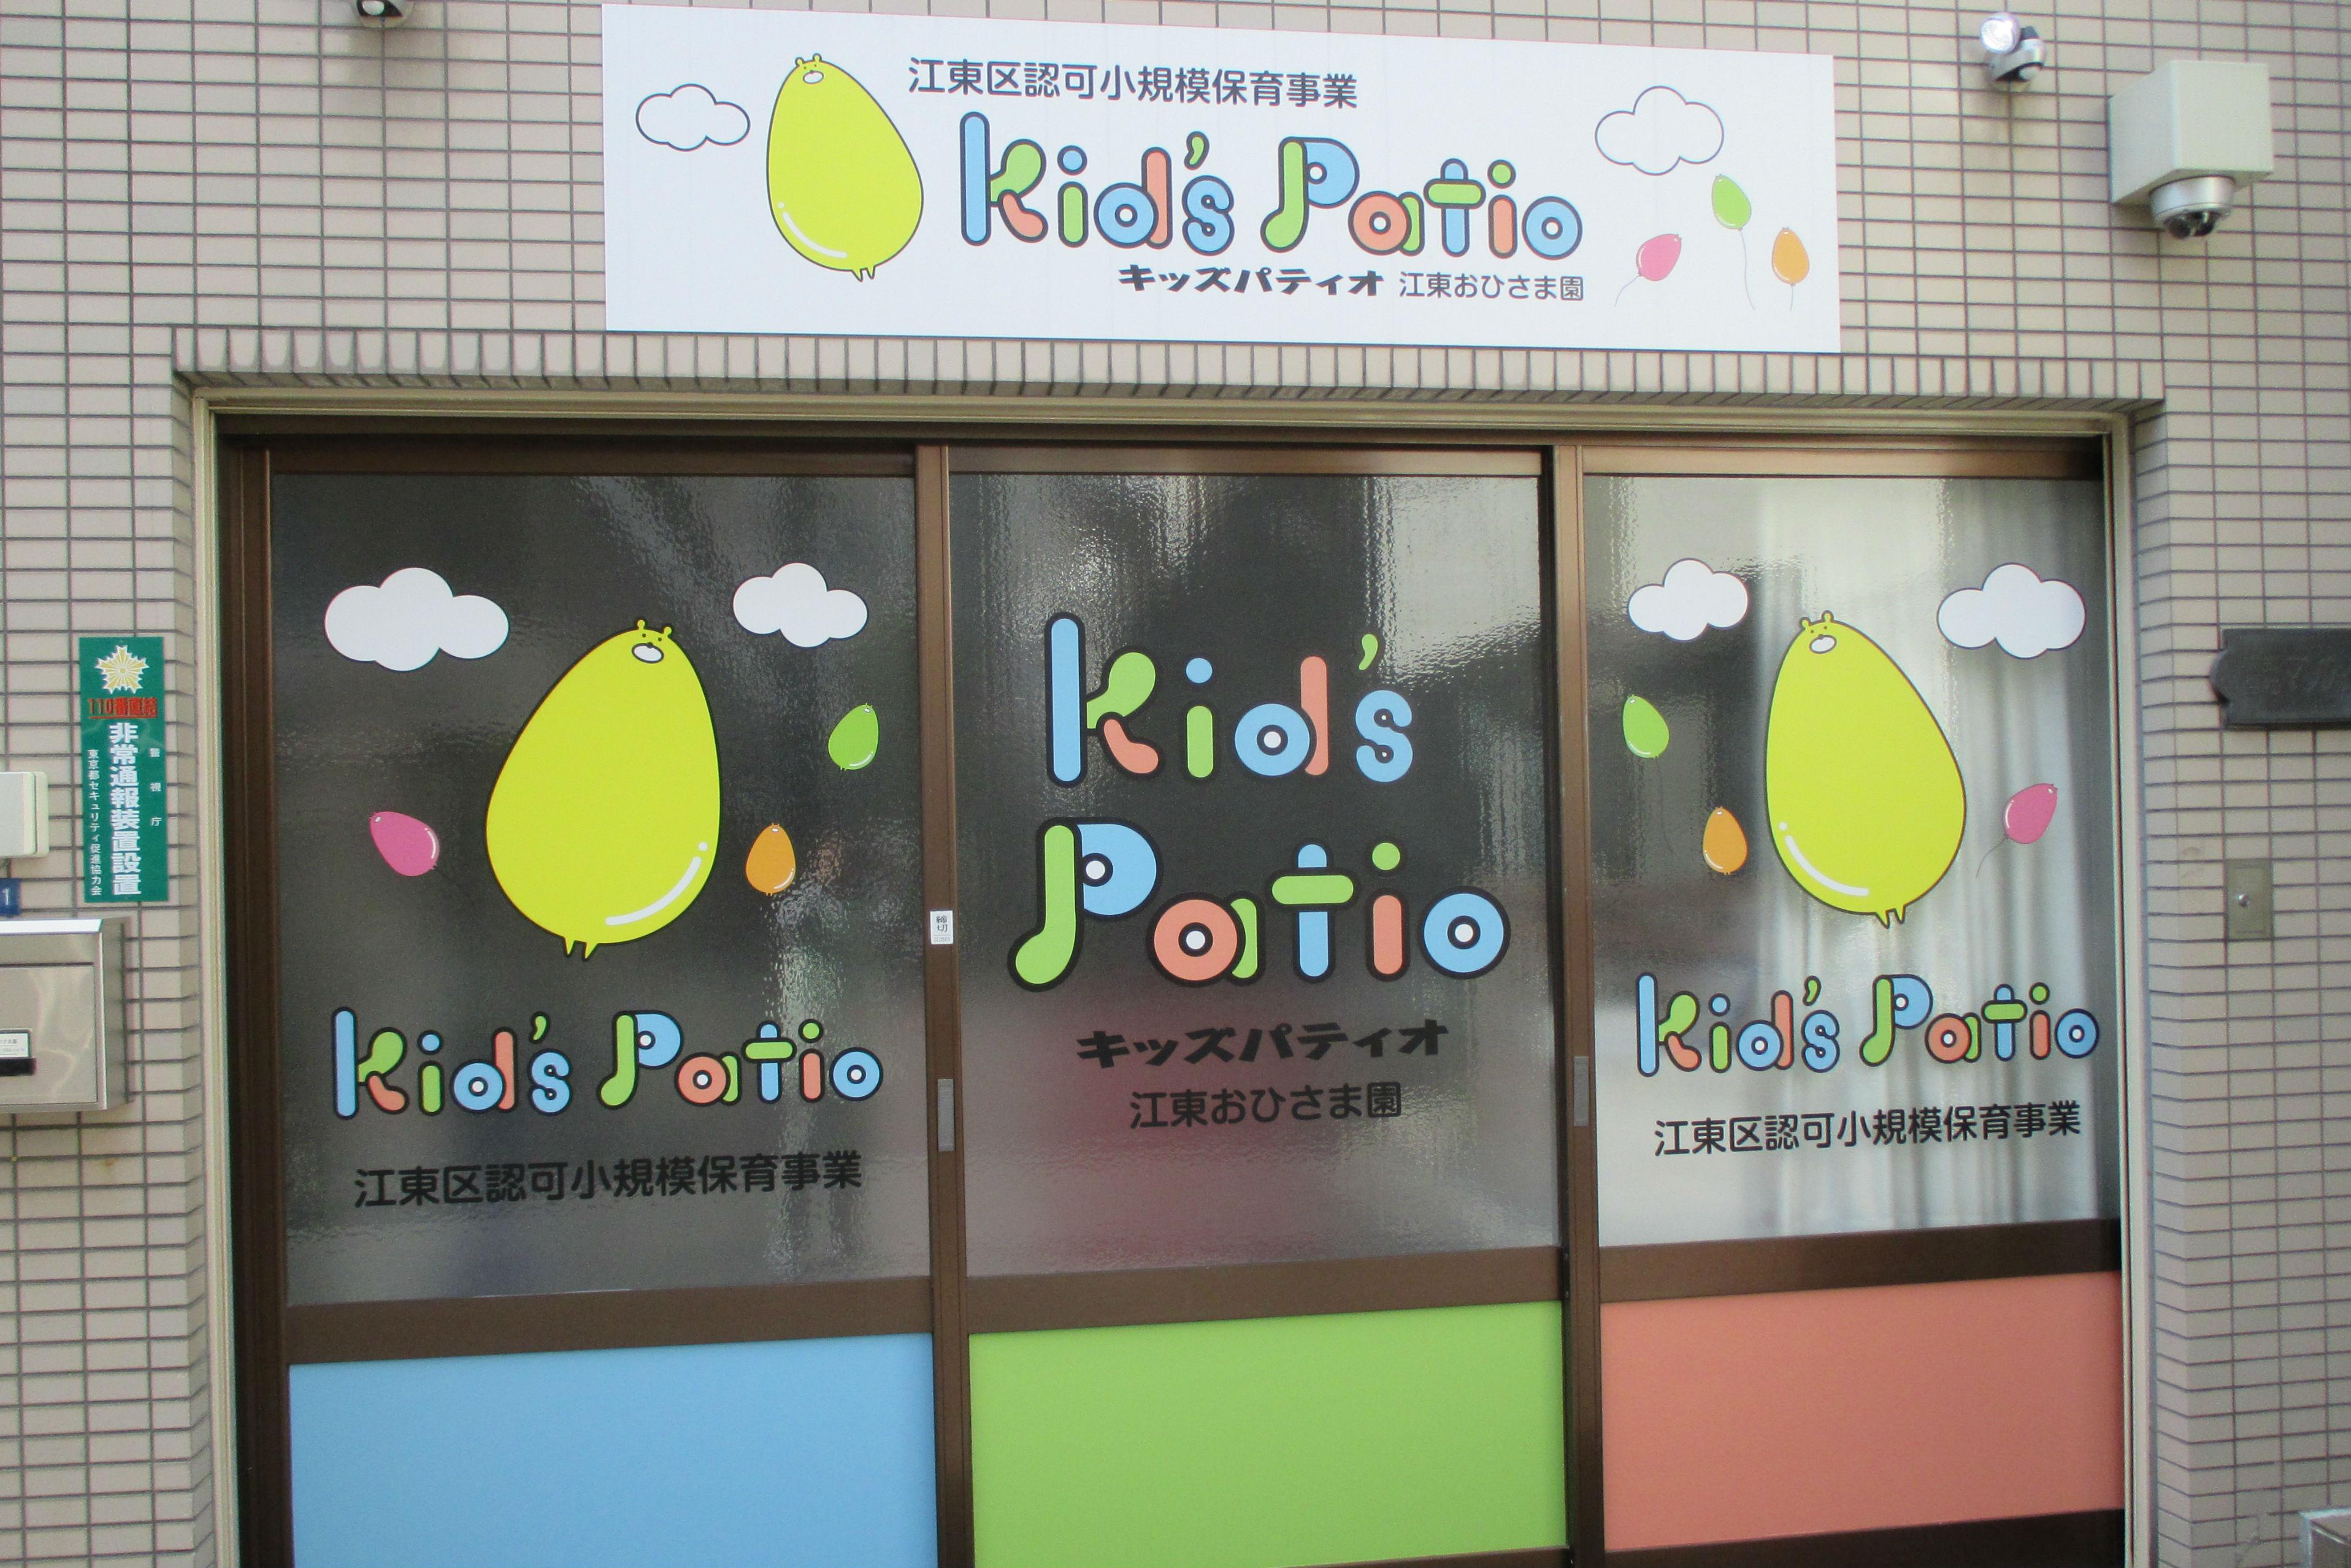 Kid'sPatio江東おひさま園(東京都江東区)